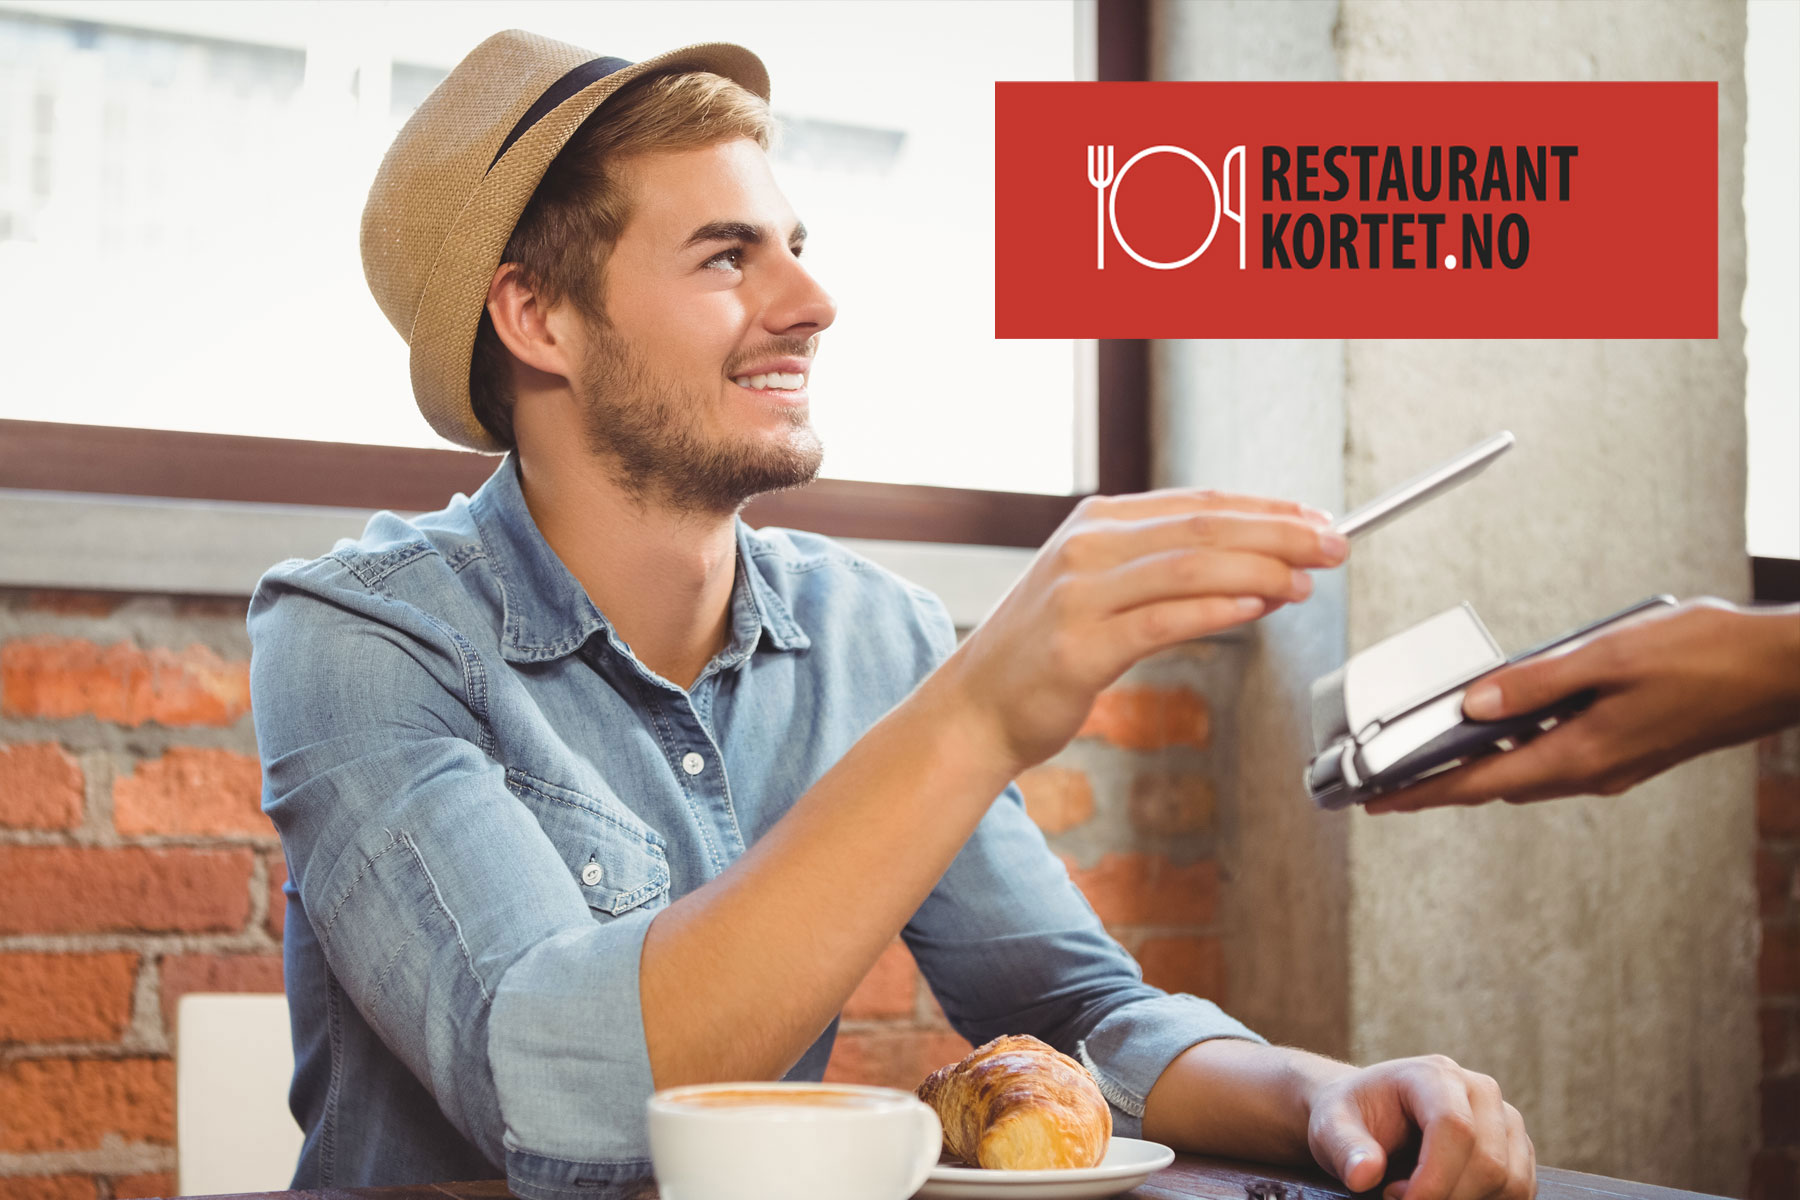 restaurantkortet_logo